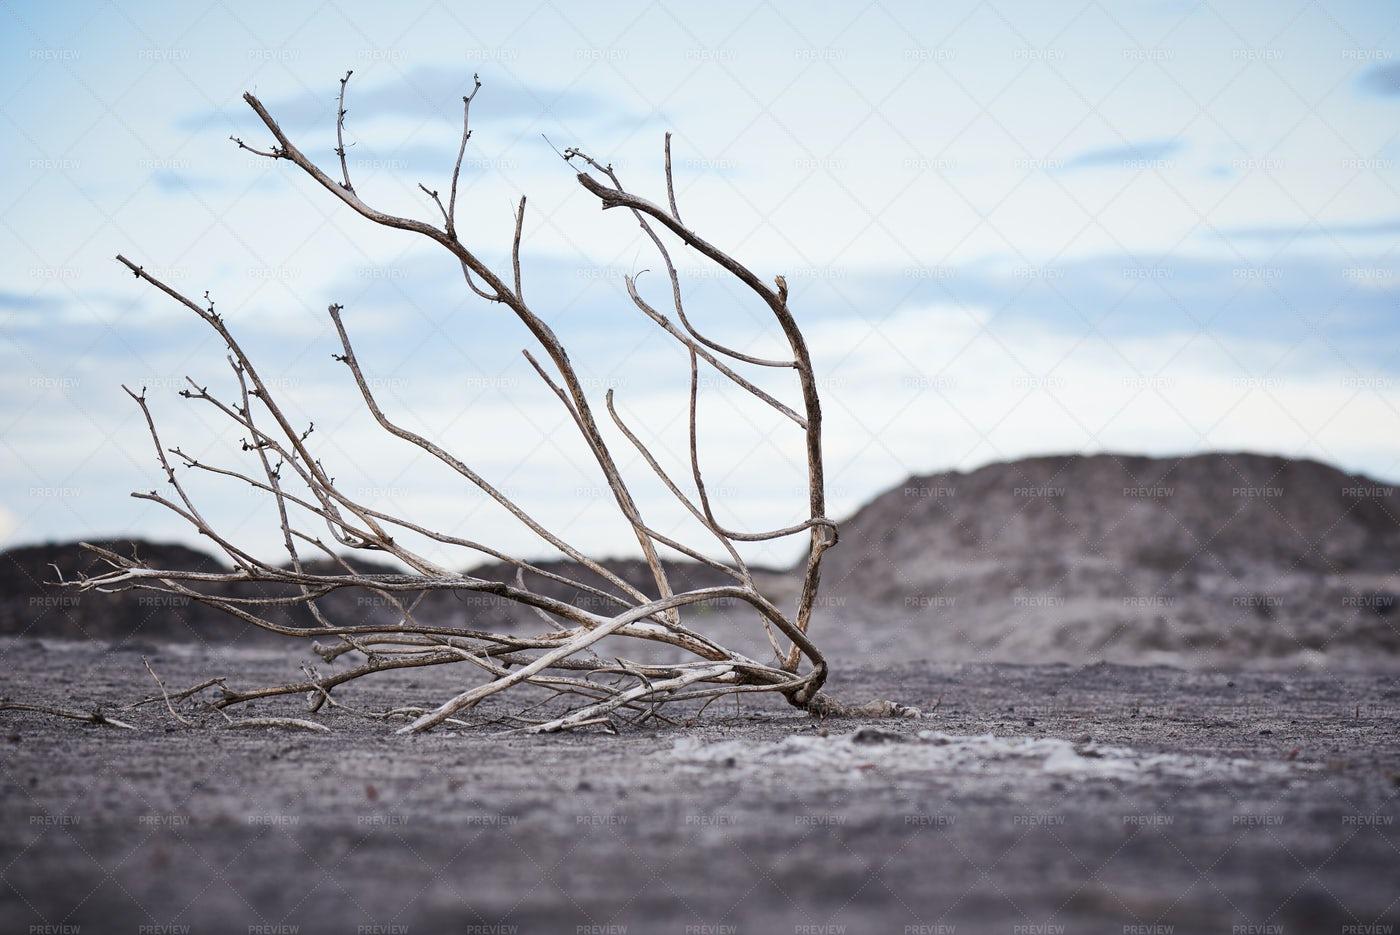 Dead Tree In Arid Soil: Stock Photos